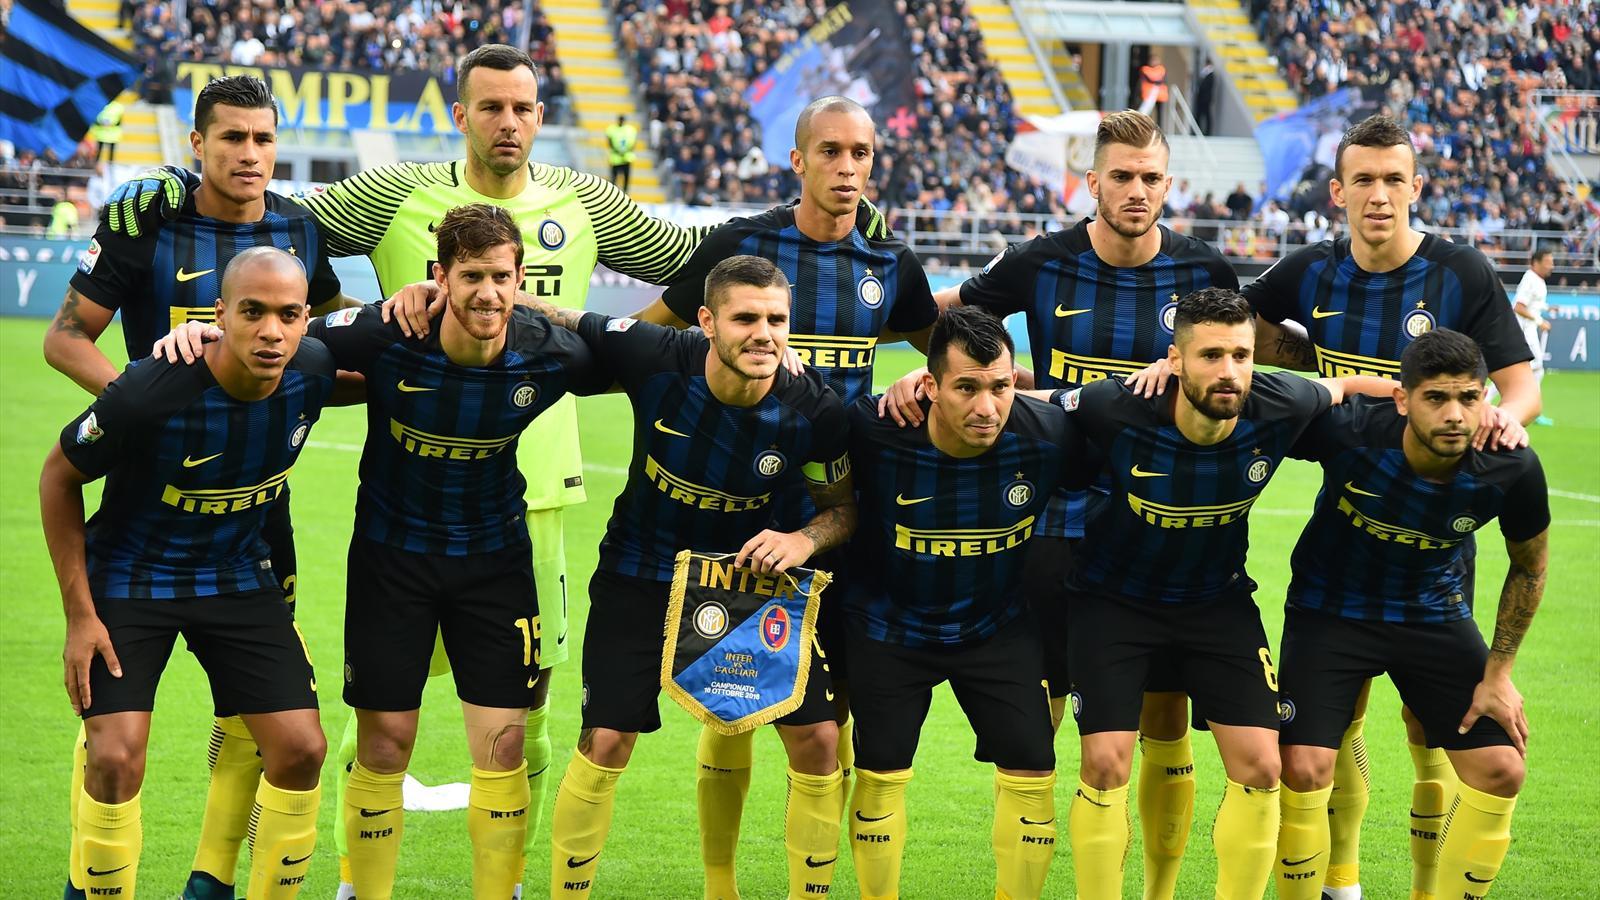 ensemble de foot AC Milan ÉQUIPE